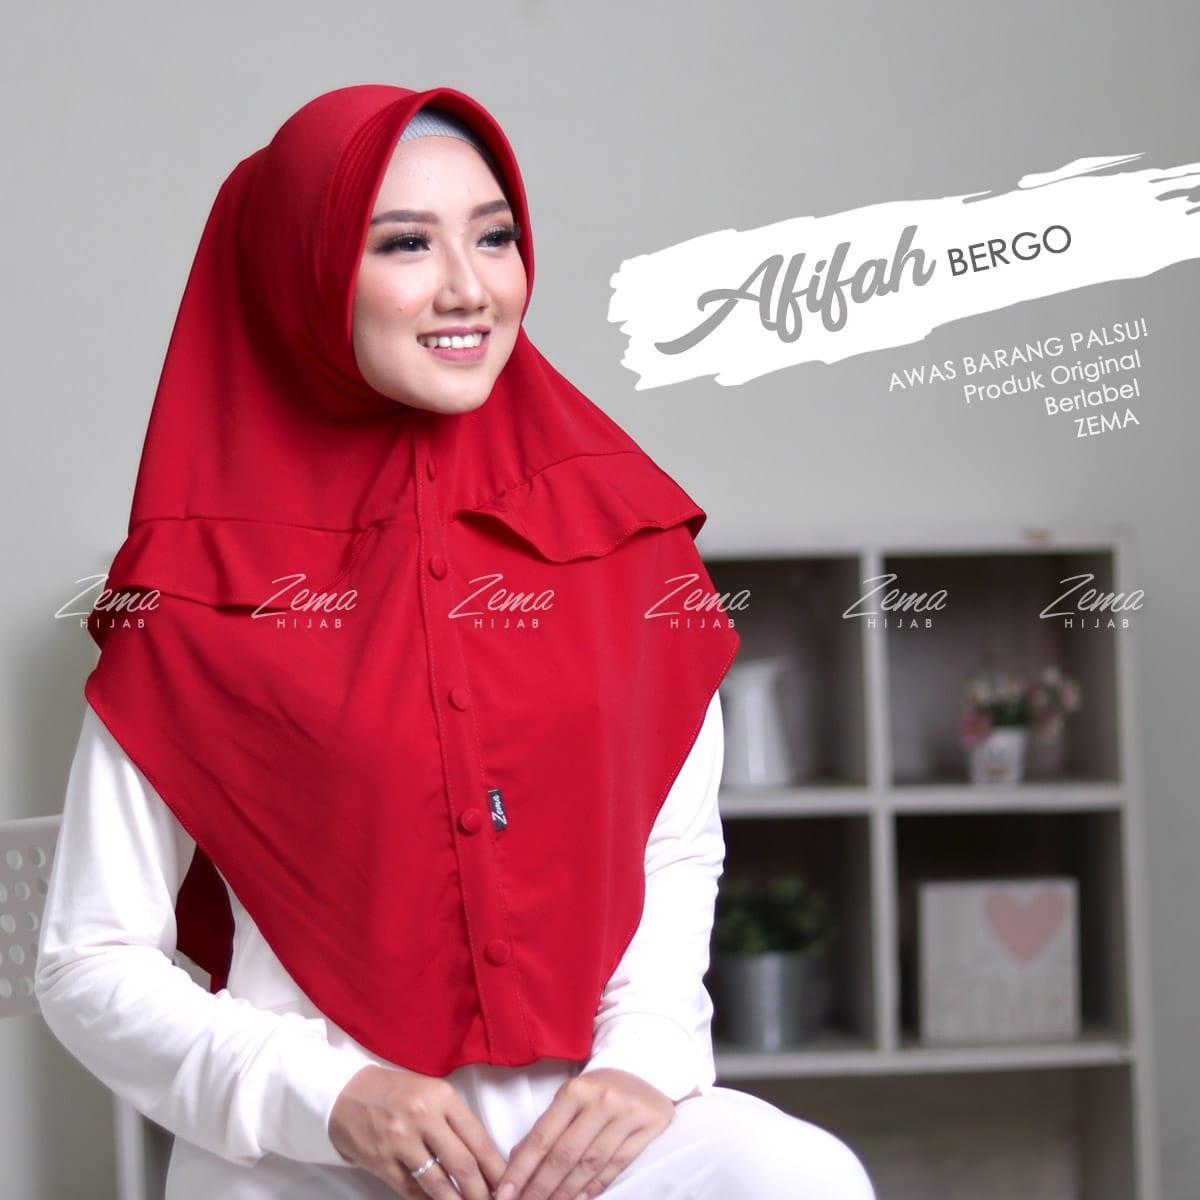 Zema Afifah Jilbab Instan